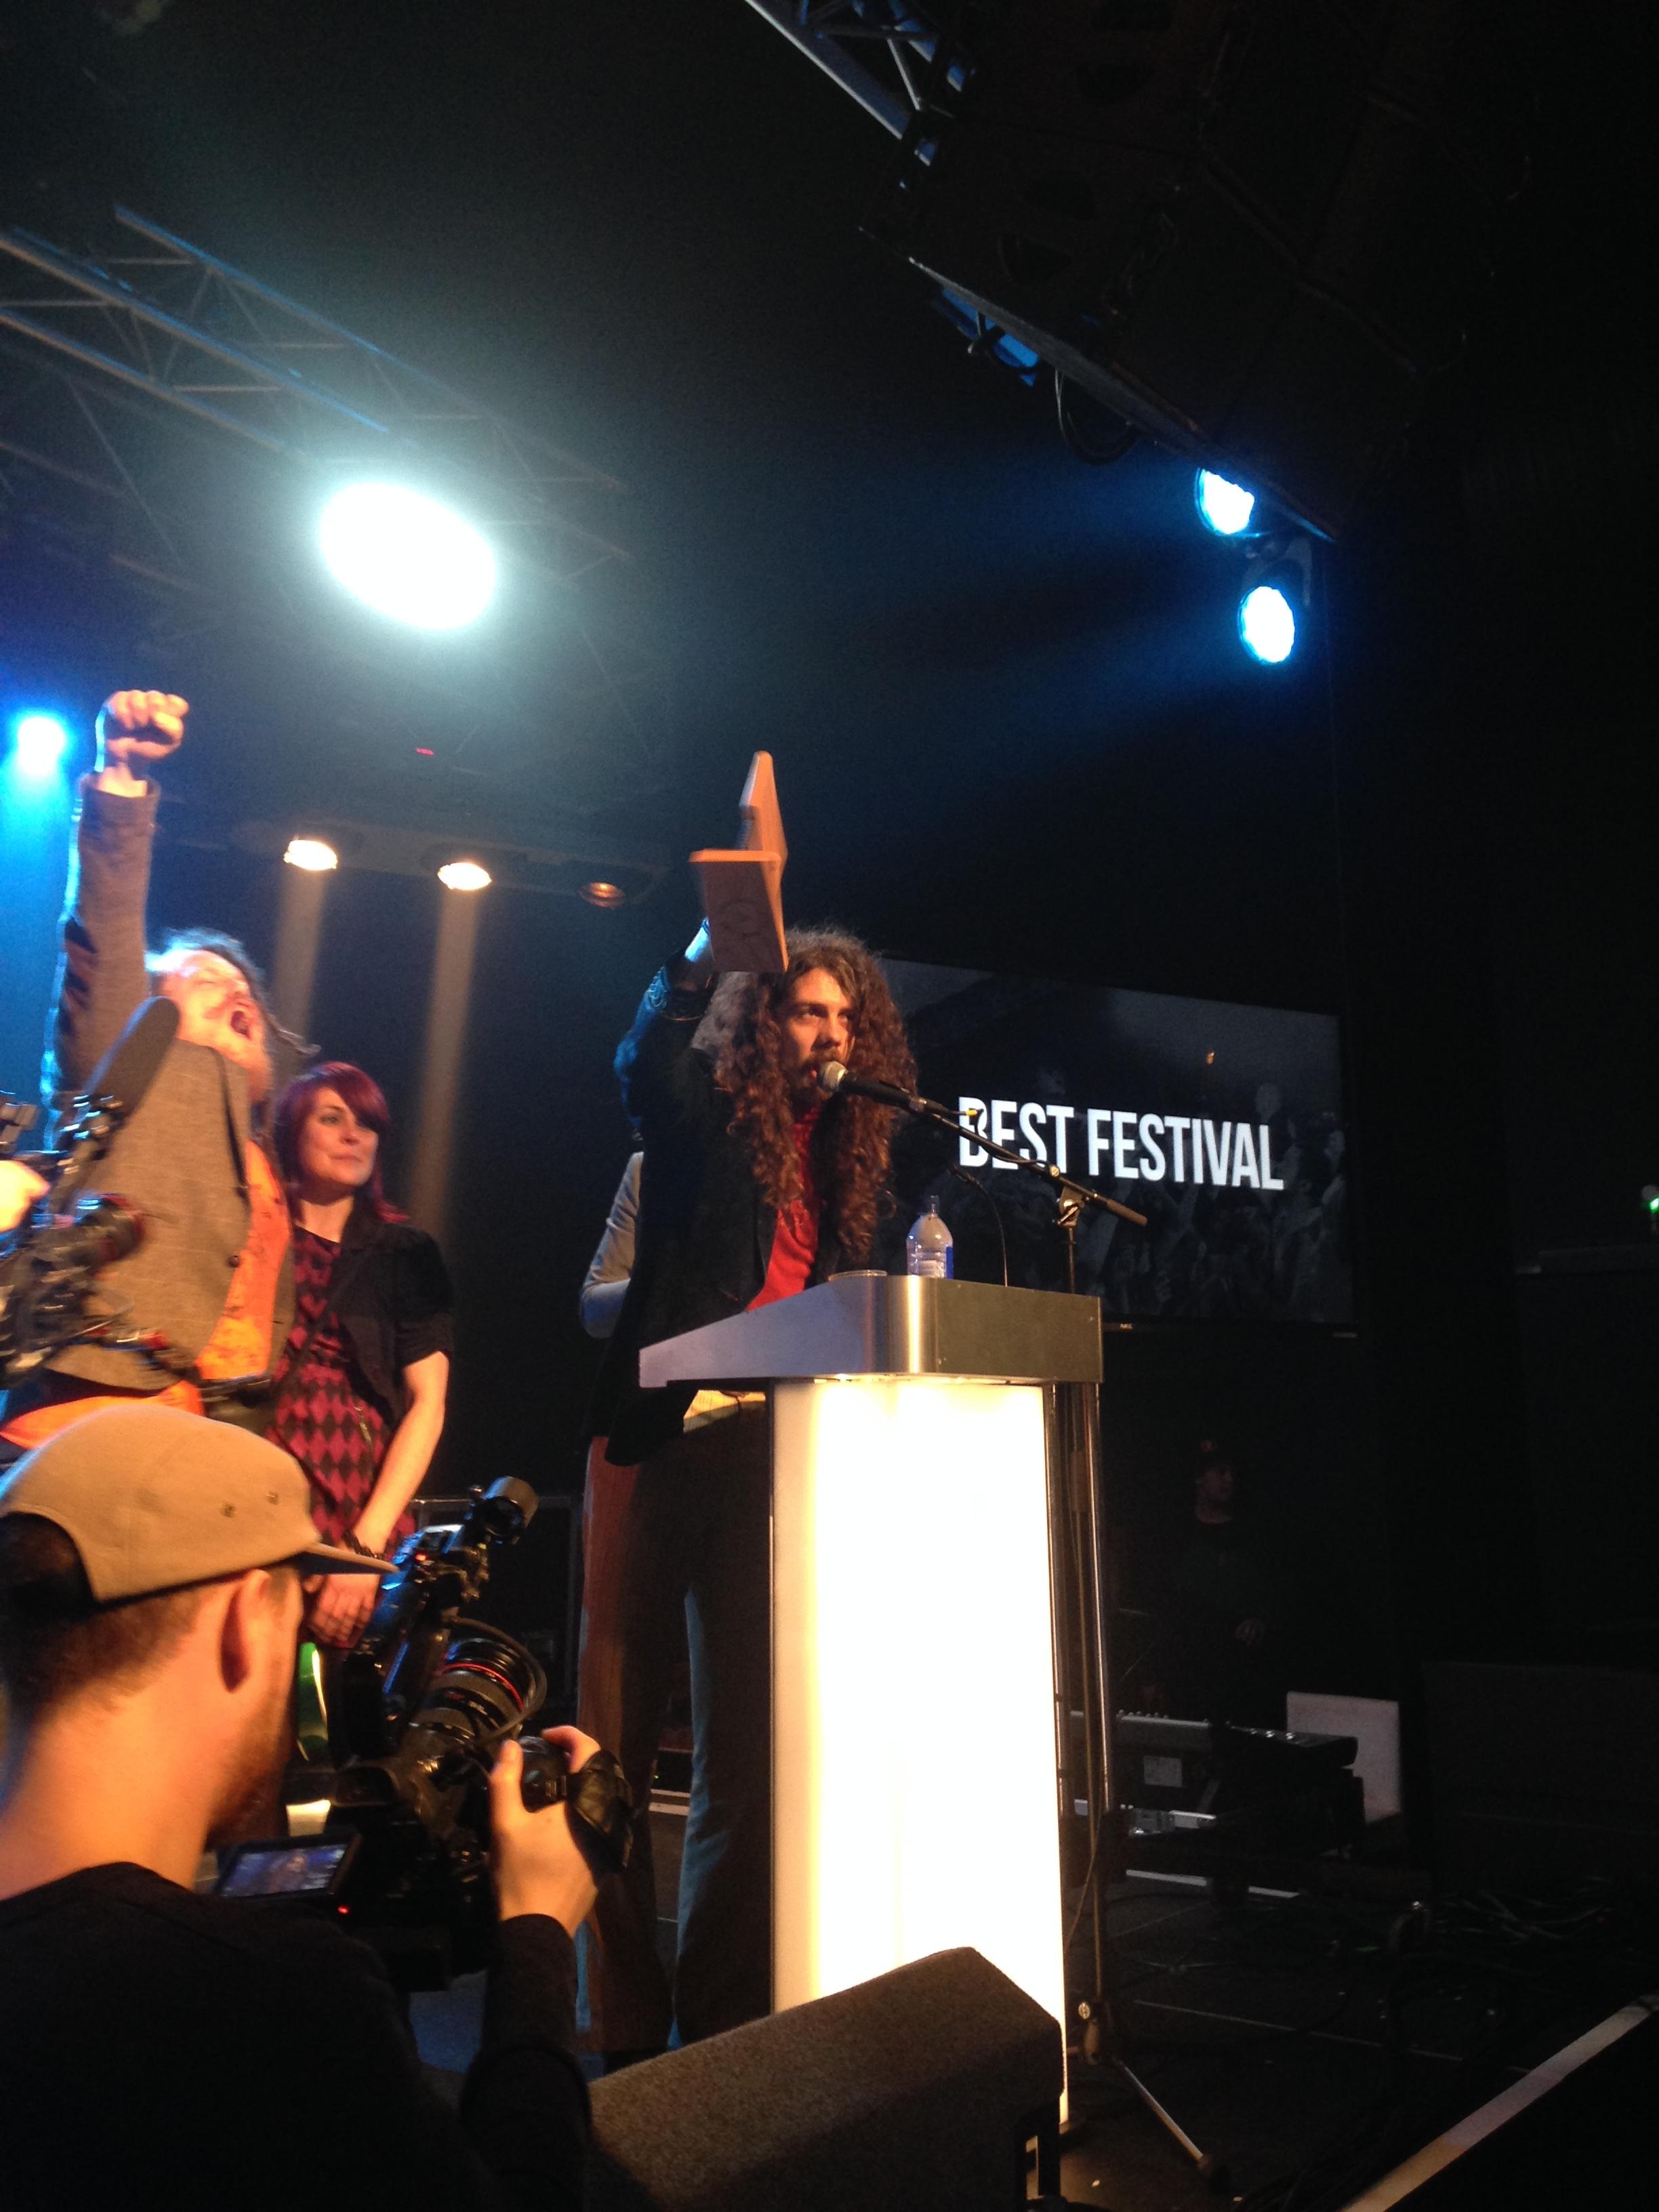 HUB winning Best Festival at the Cardiff Music Awards!